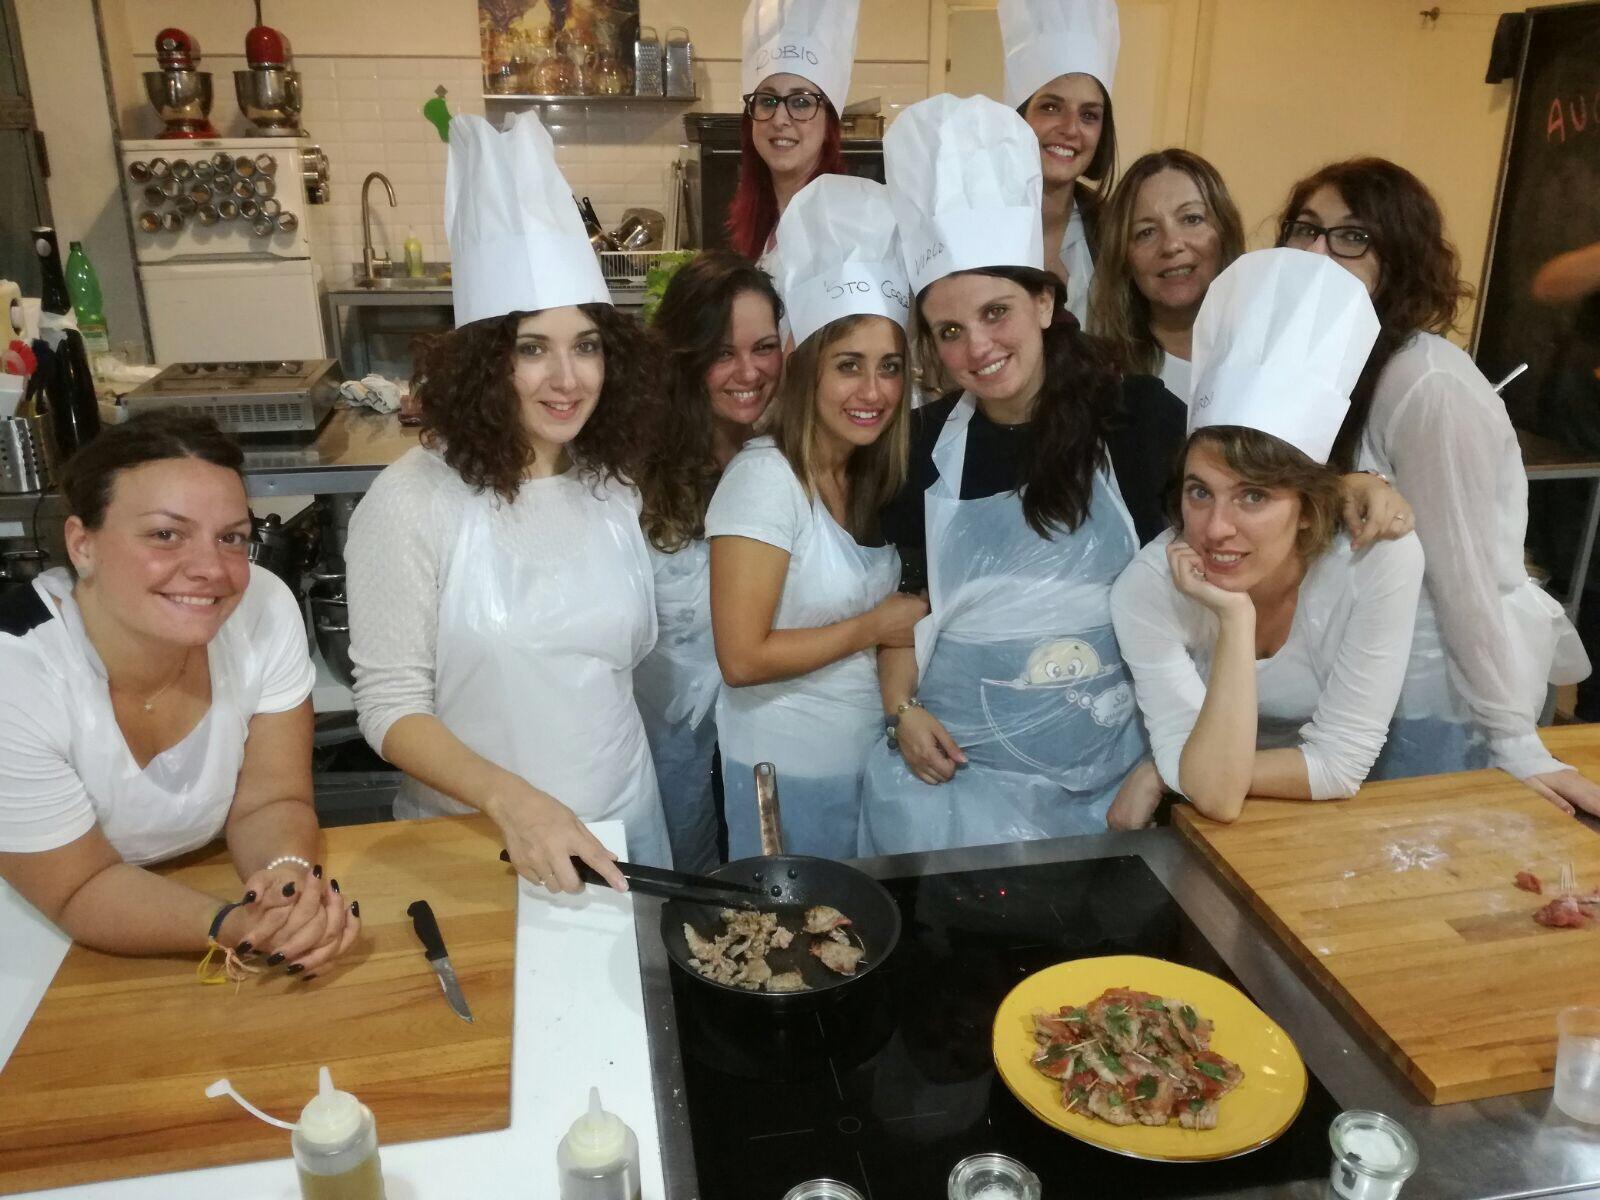 Cooking party la tua festa in cucina mind scuola di cucina roma - Scuola di cucina roma ...